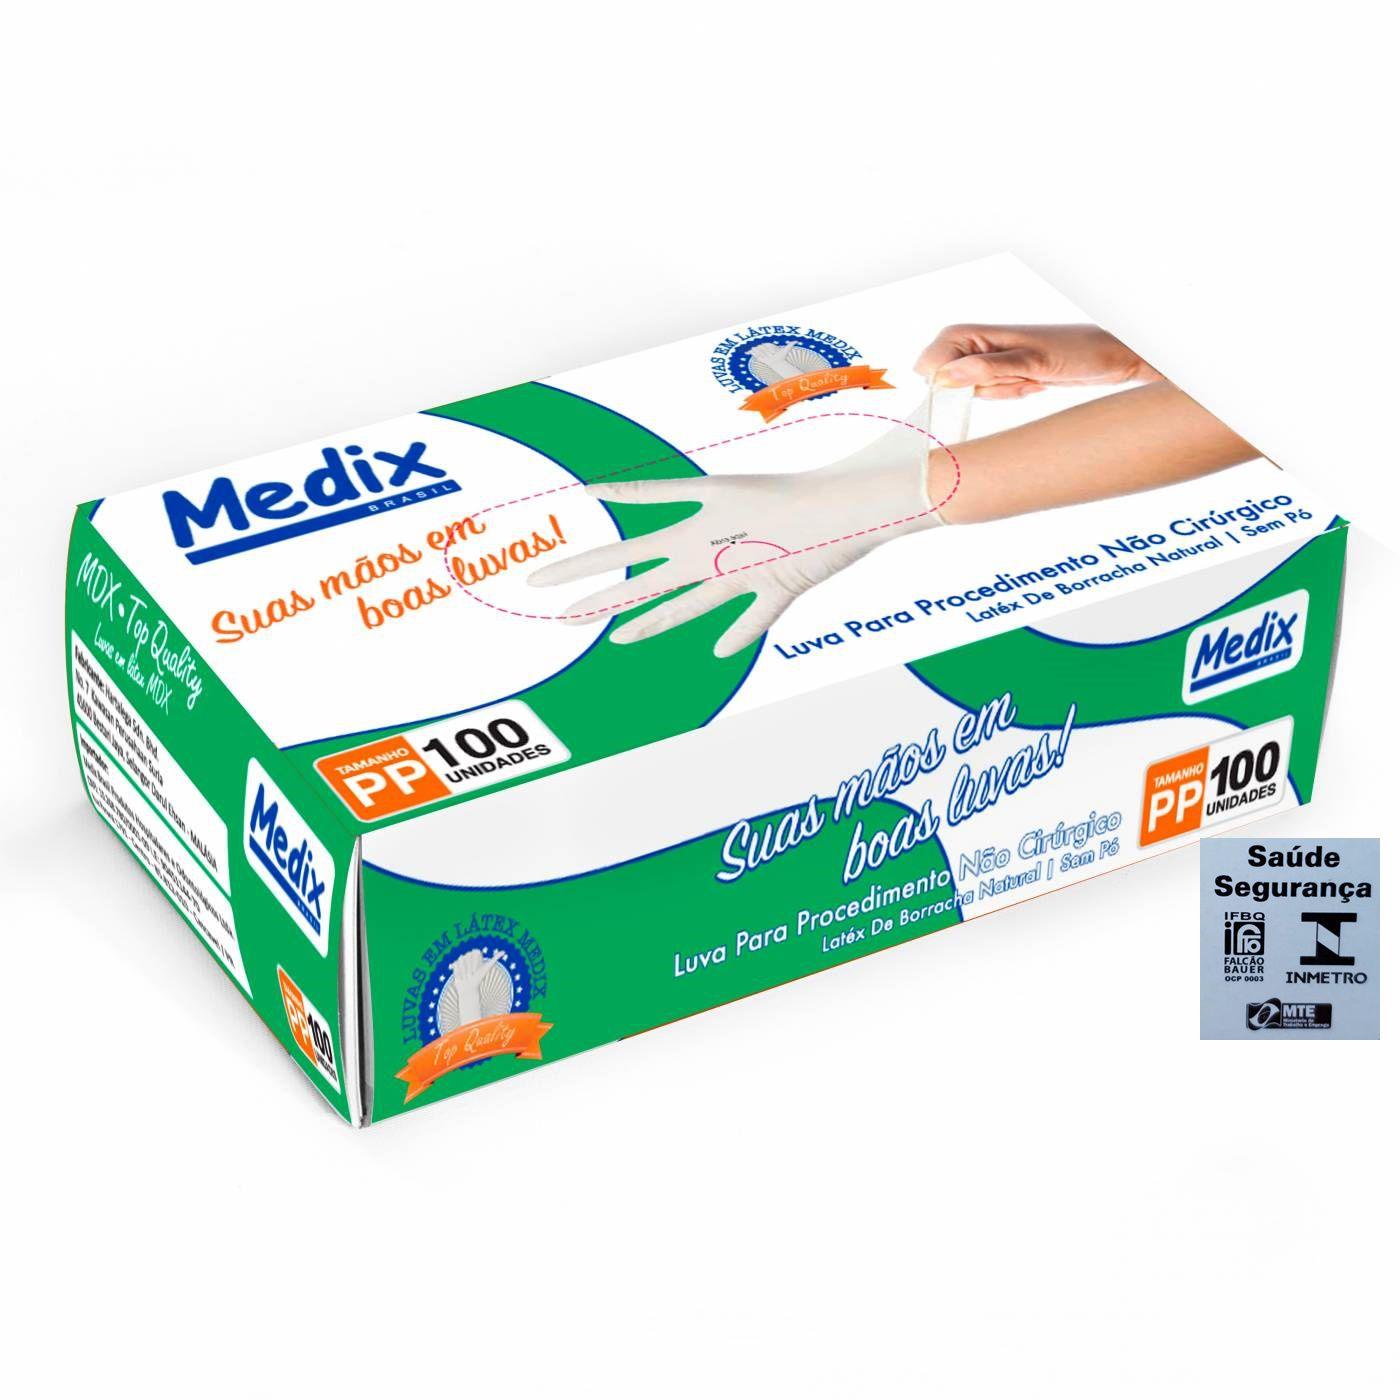 Luva de Procedimentos - Sem pó - Medix